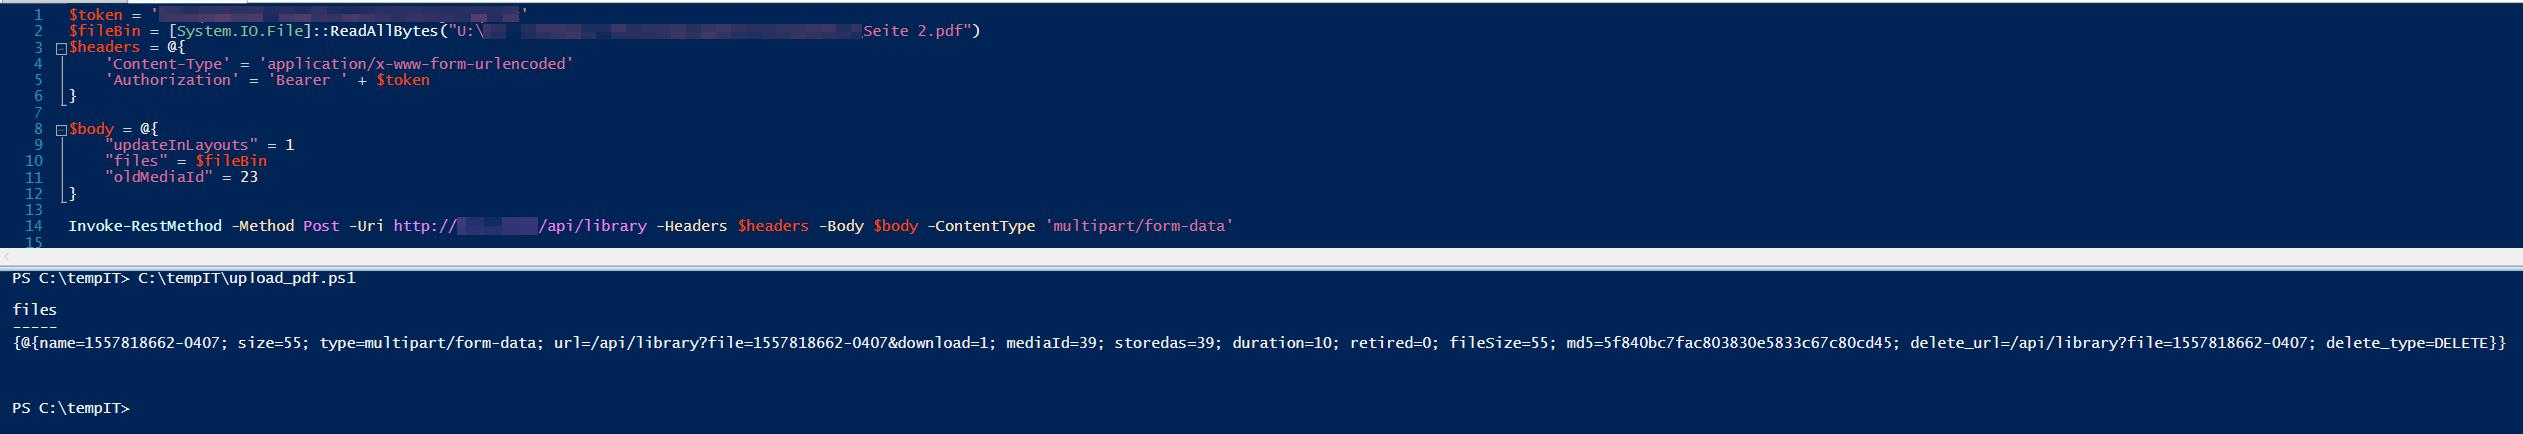 Uploading a pdf via powershell results in some jibberish